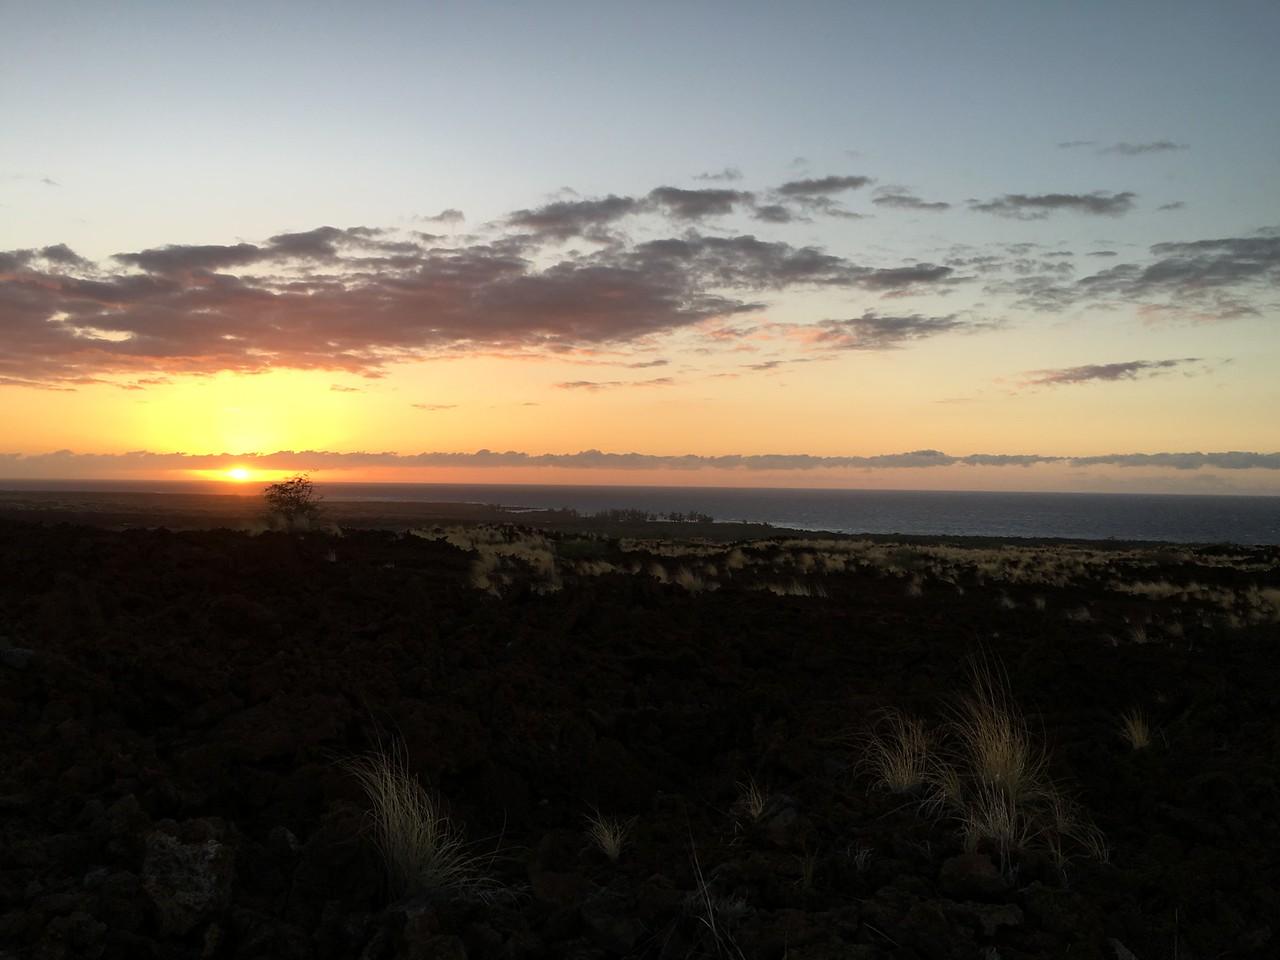 Sunset, Kekaha Kai State Park, Kailua-Kona